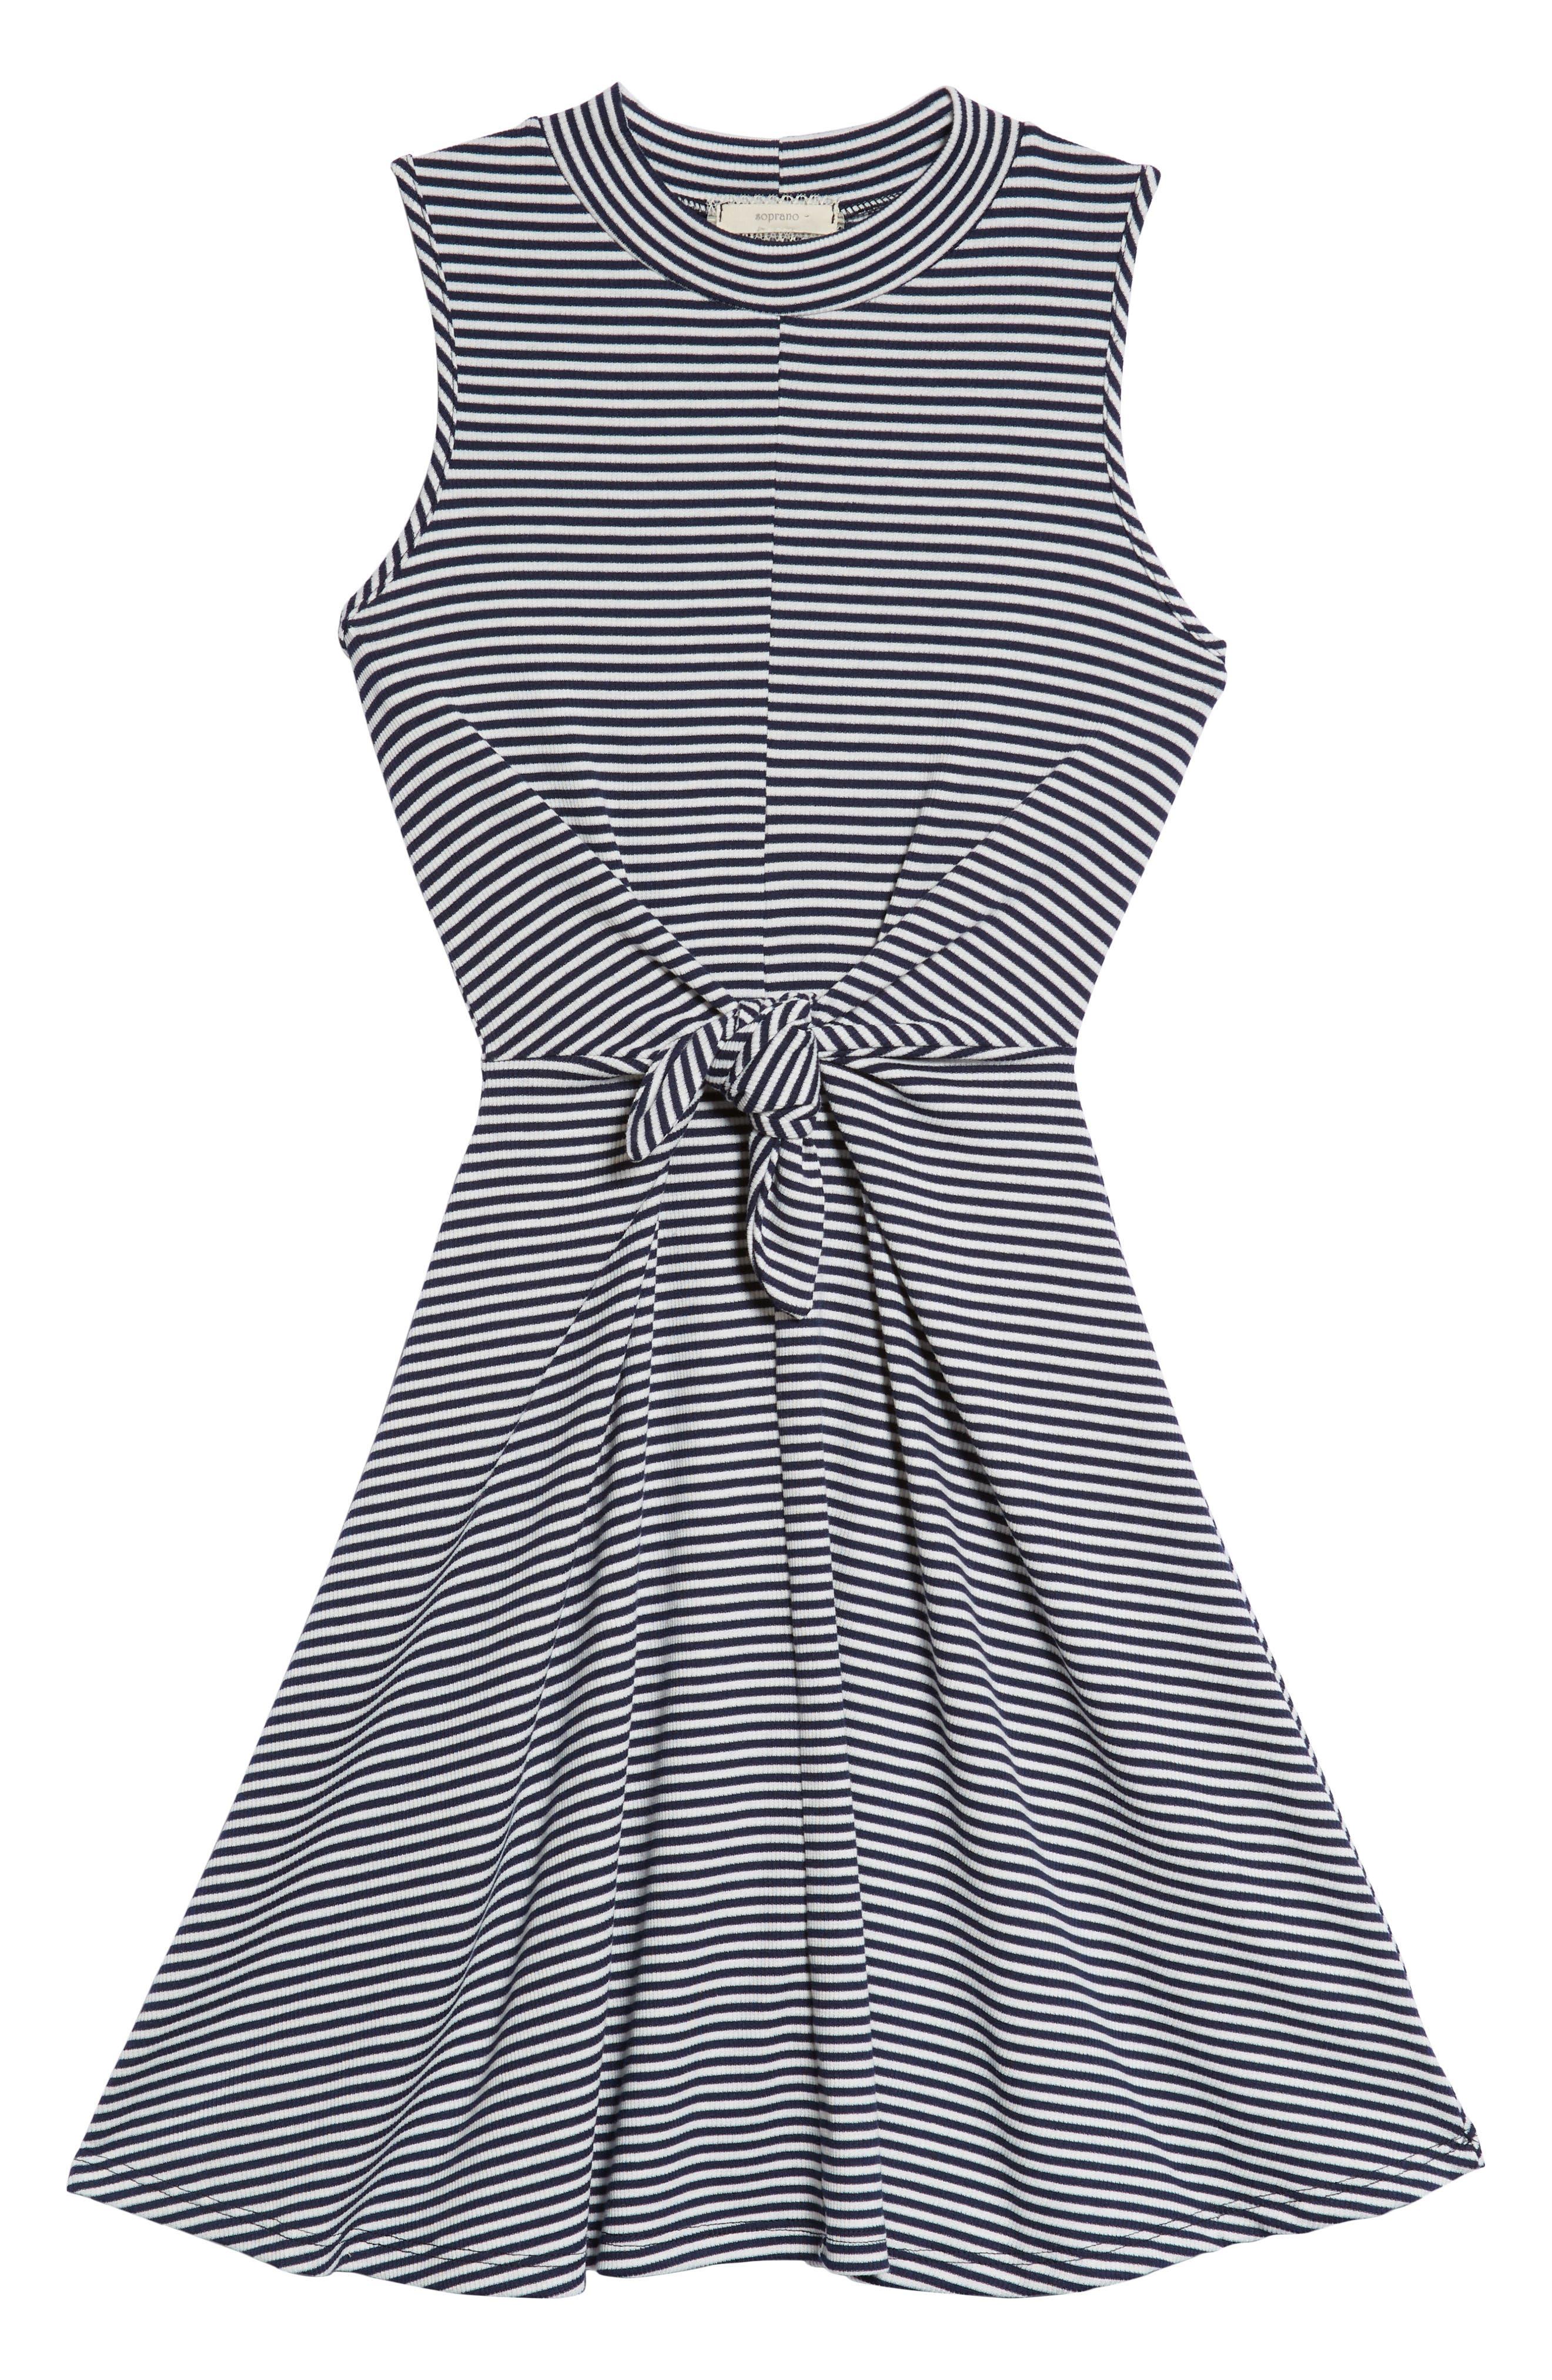 Tie Front Skater Dress,                             Main thumbnail 1, color,                             Navy/ White